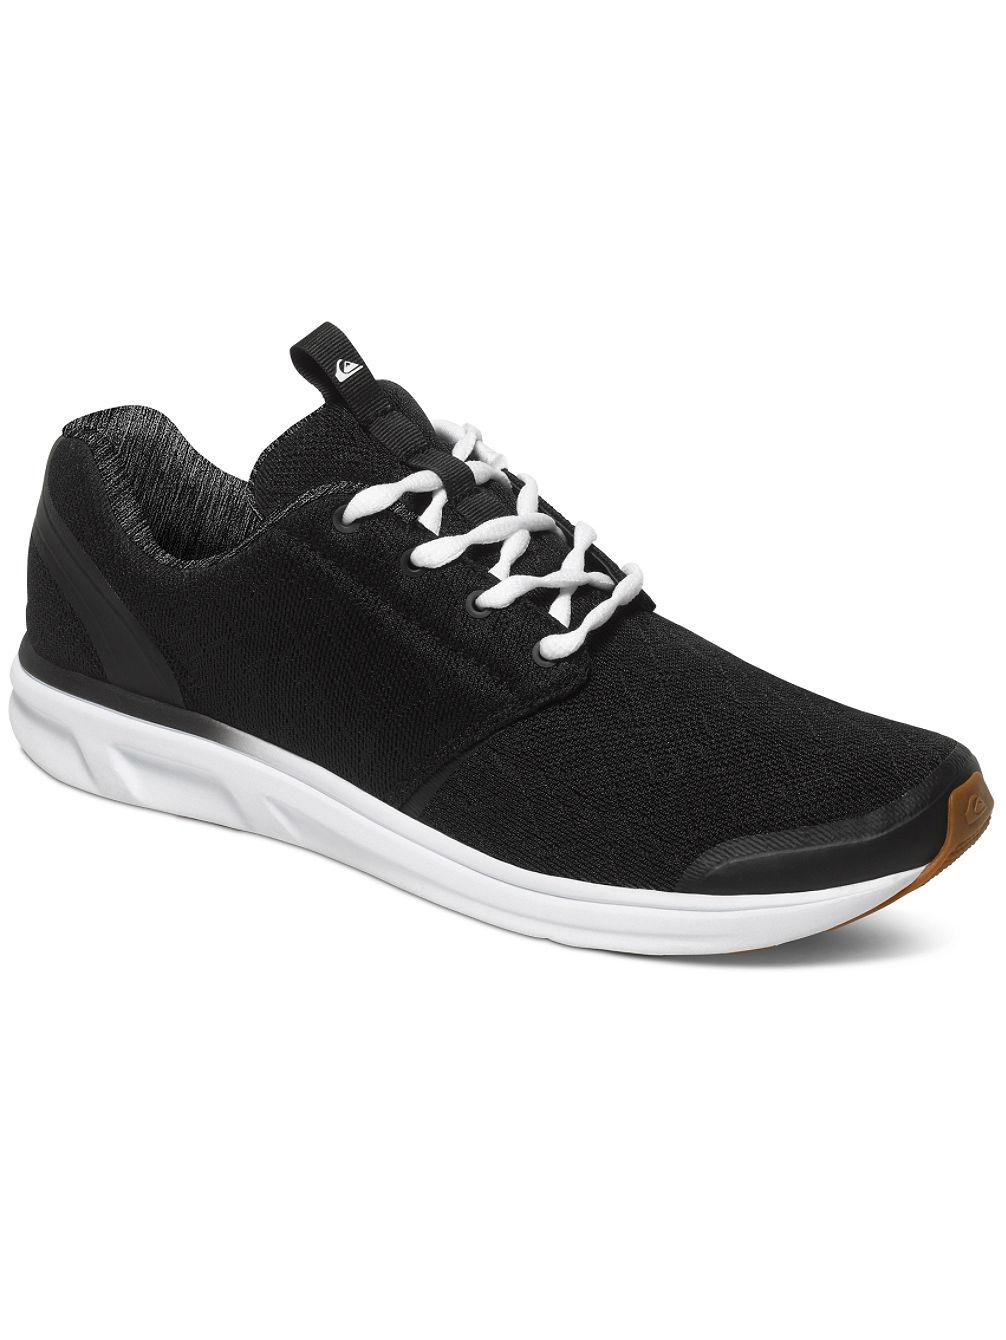 quiksilver-voyage-sneakers